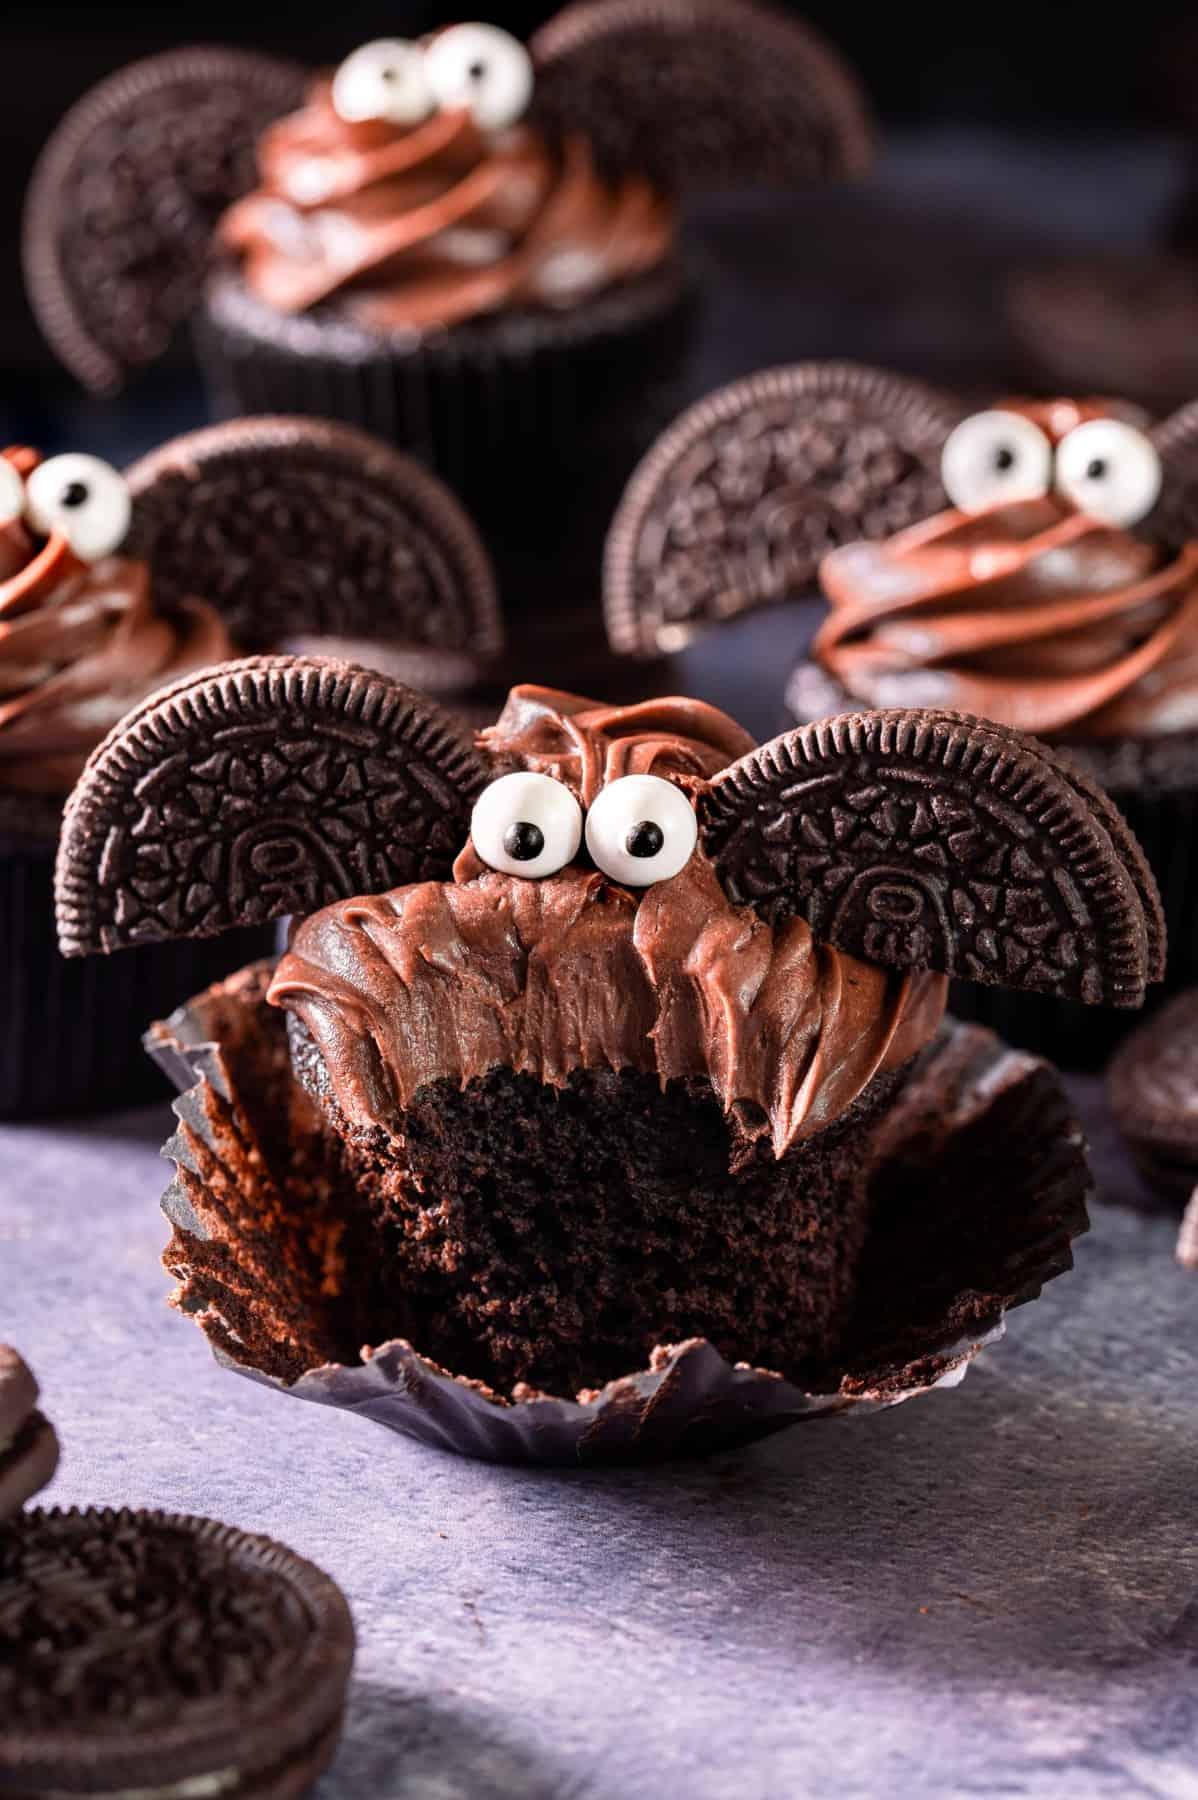 A large bite taken from a chocolate bat Halloween cupcake